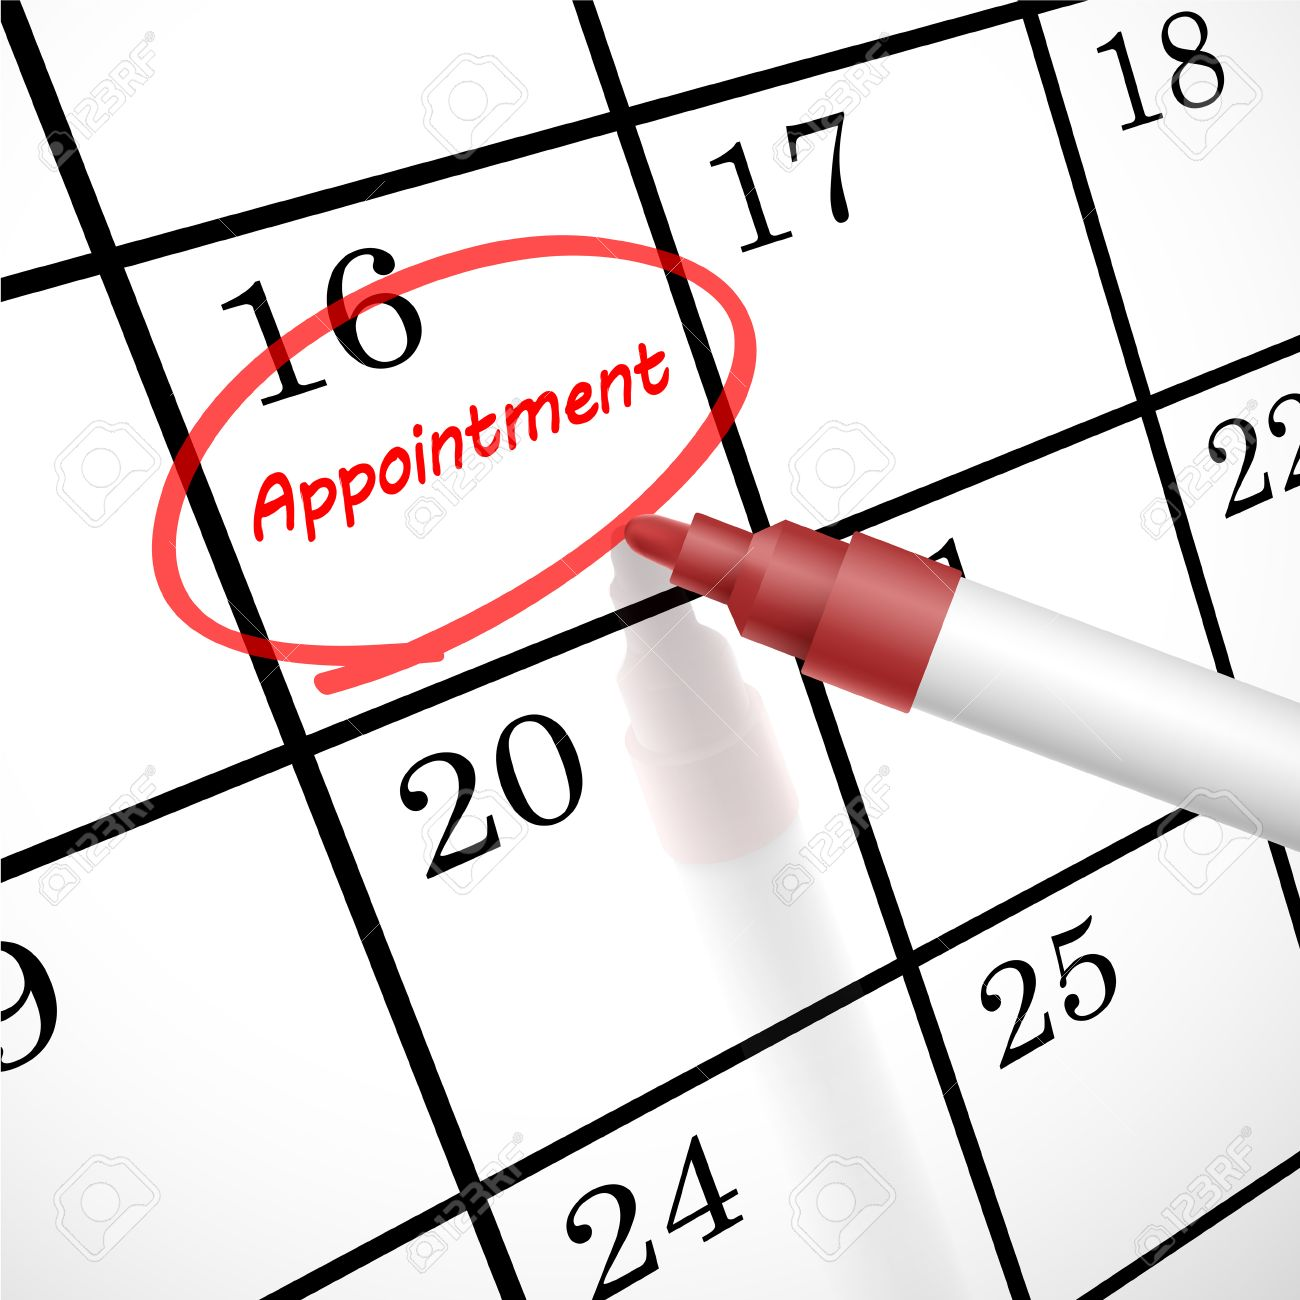 appointment calandar